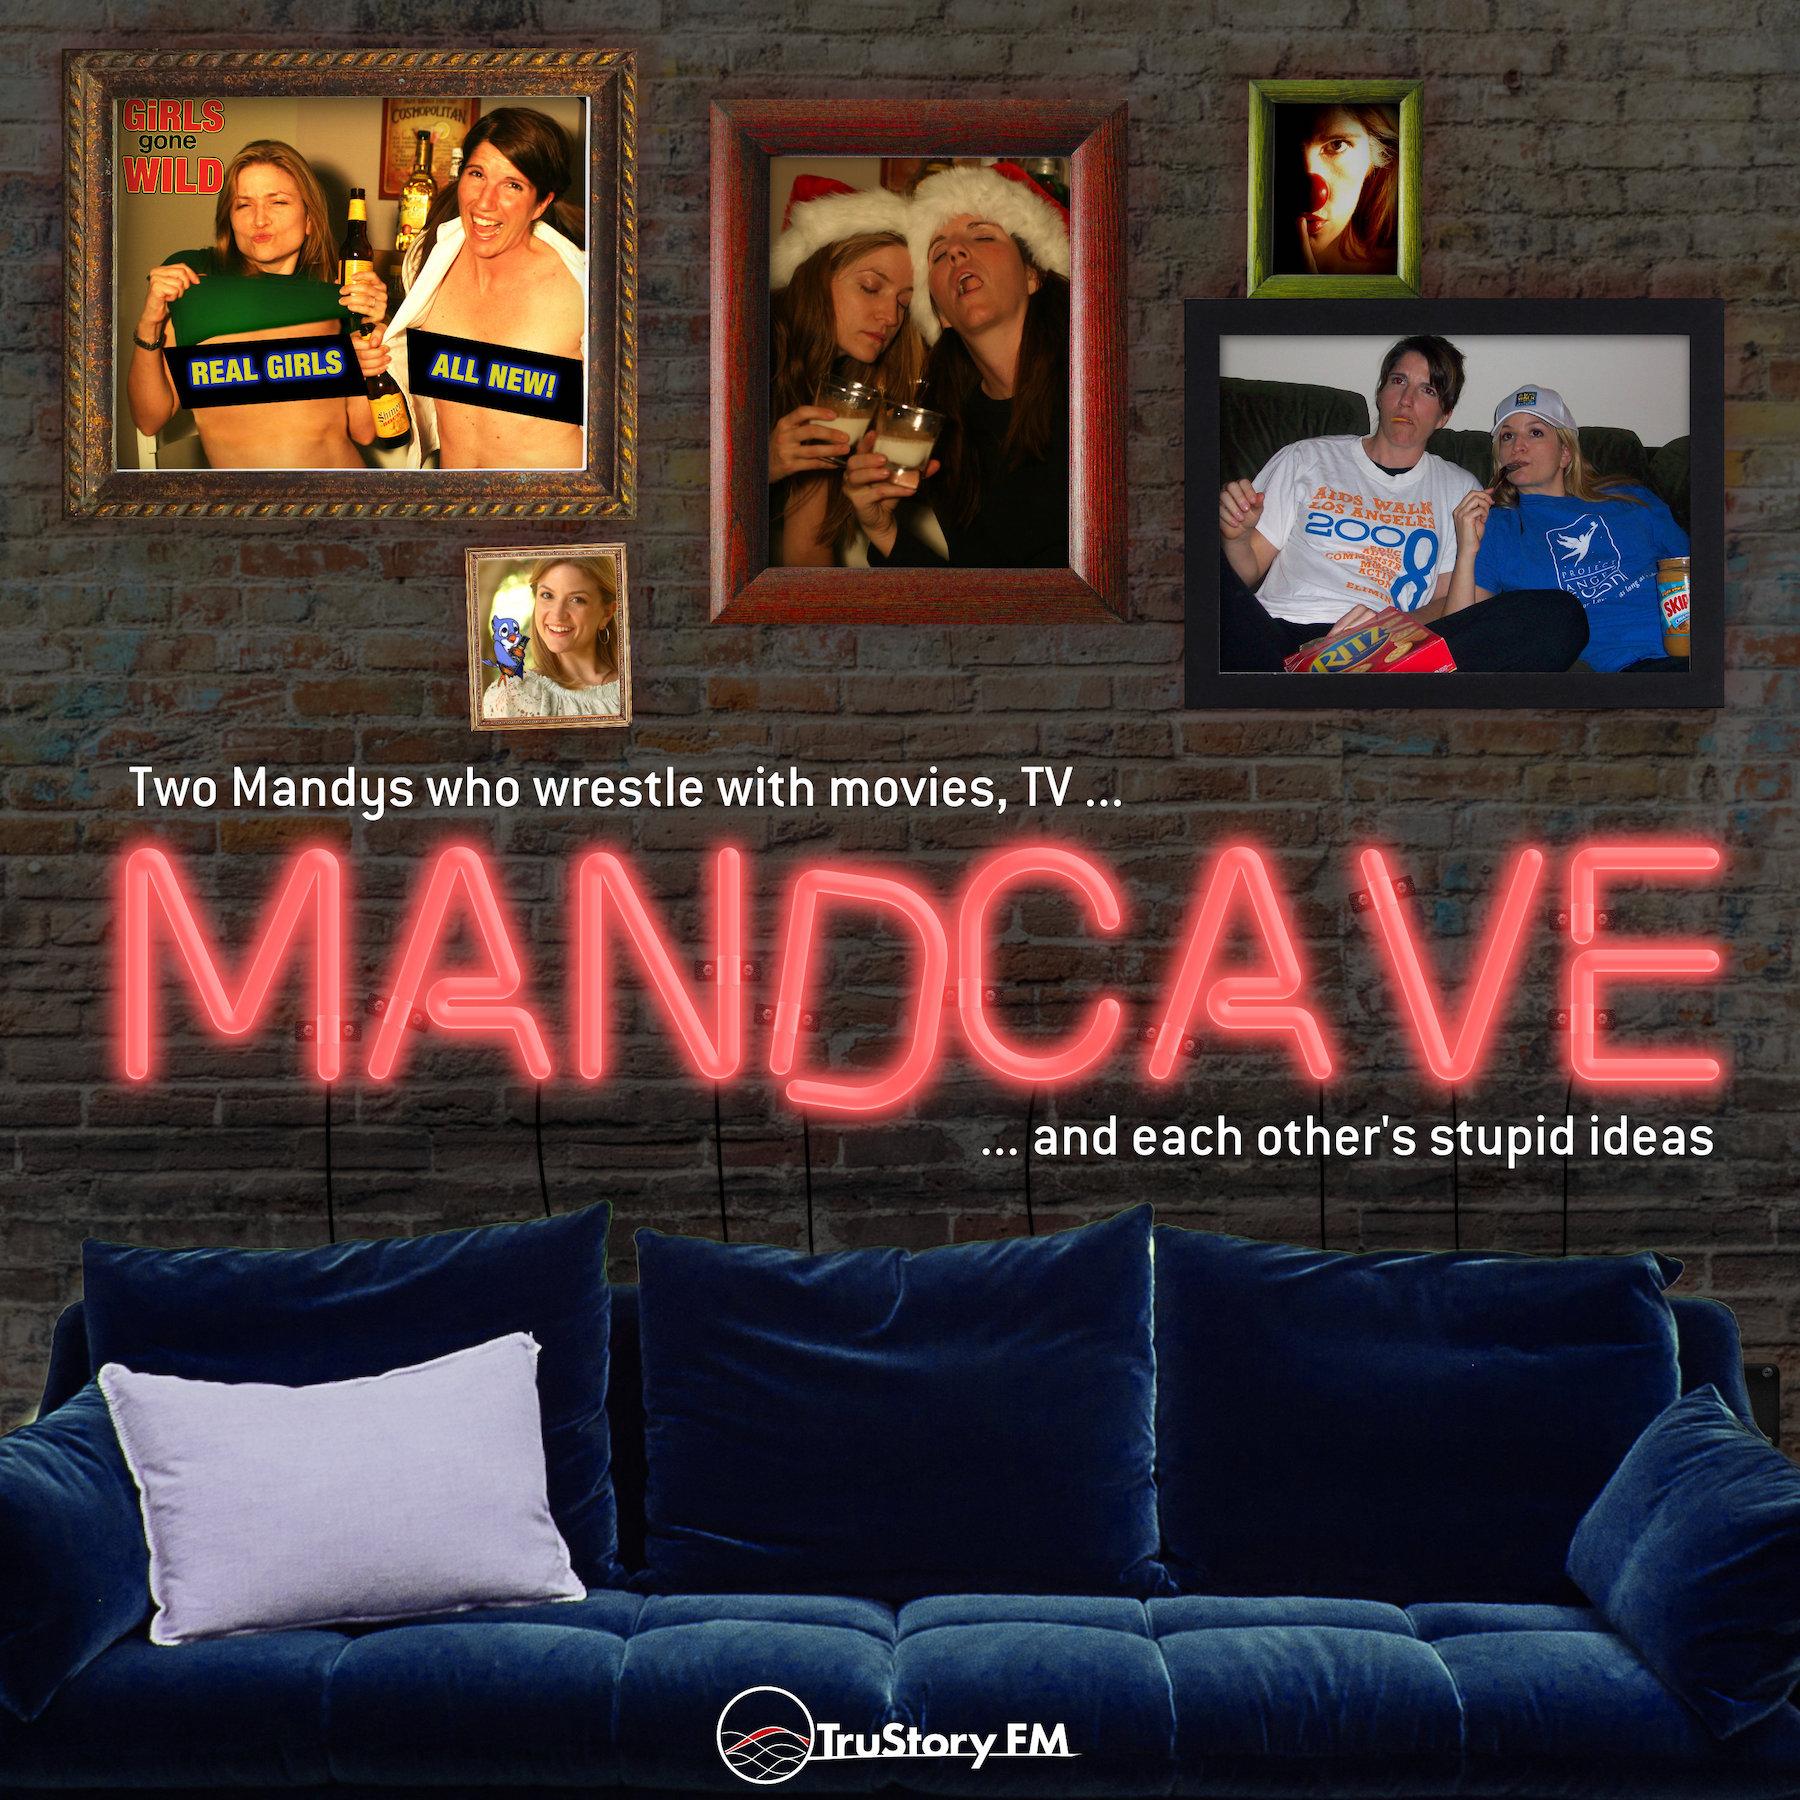 MandCave Thumbnail Logo